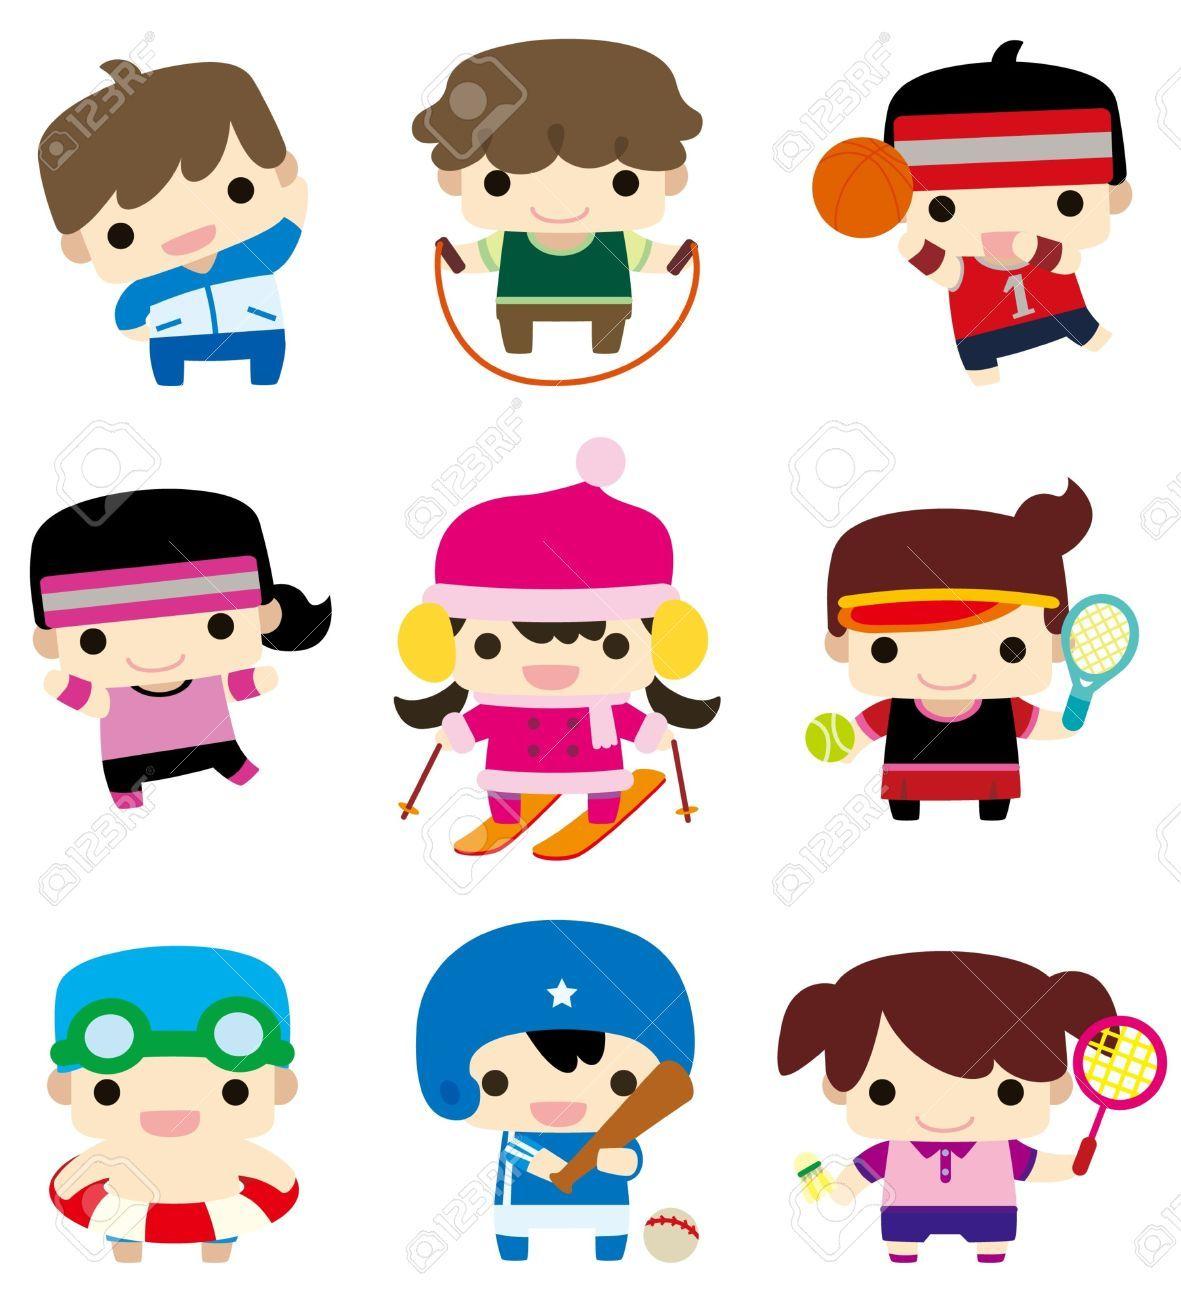 badminton cartoon draw recherche google club de